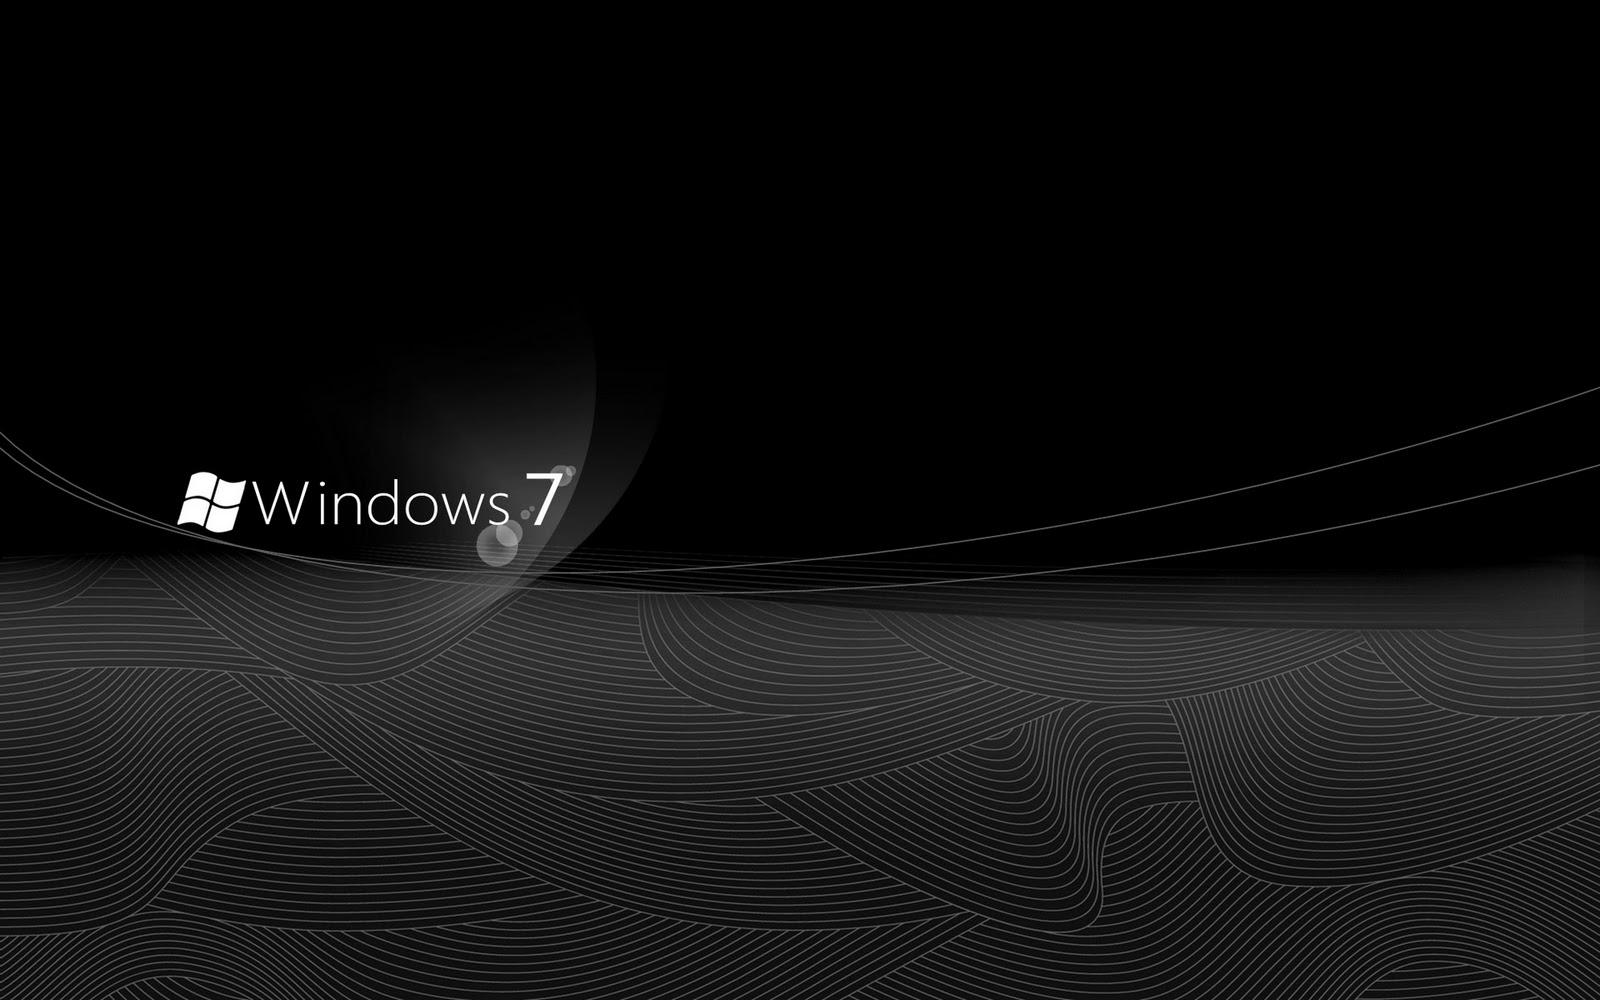 Windows 7 Theme Wallpapers Black 2012 235342634